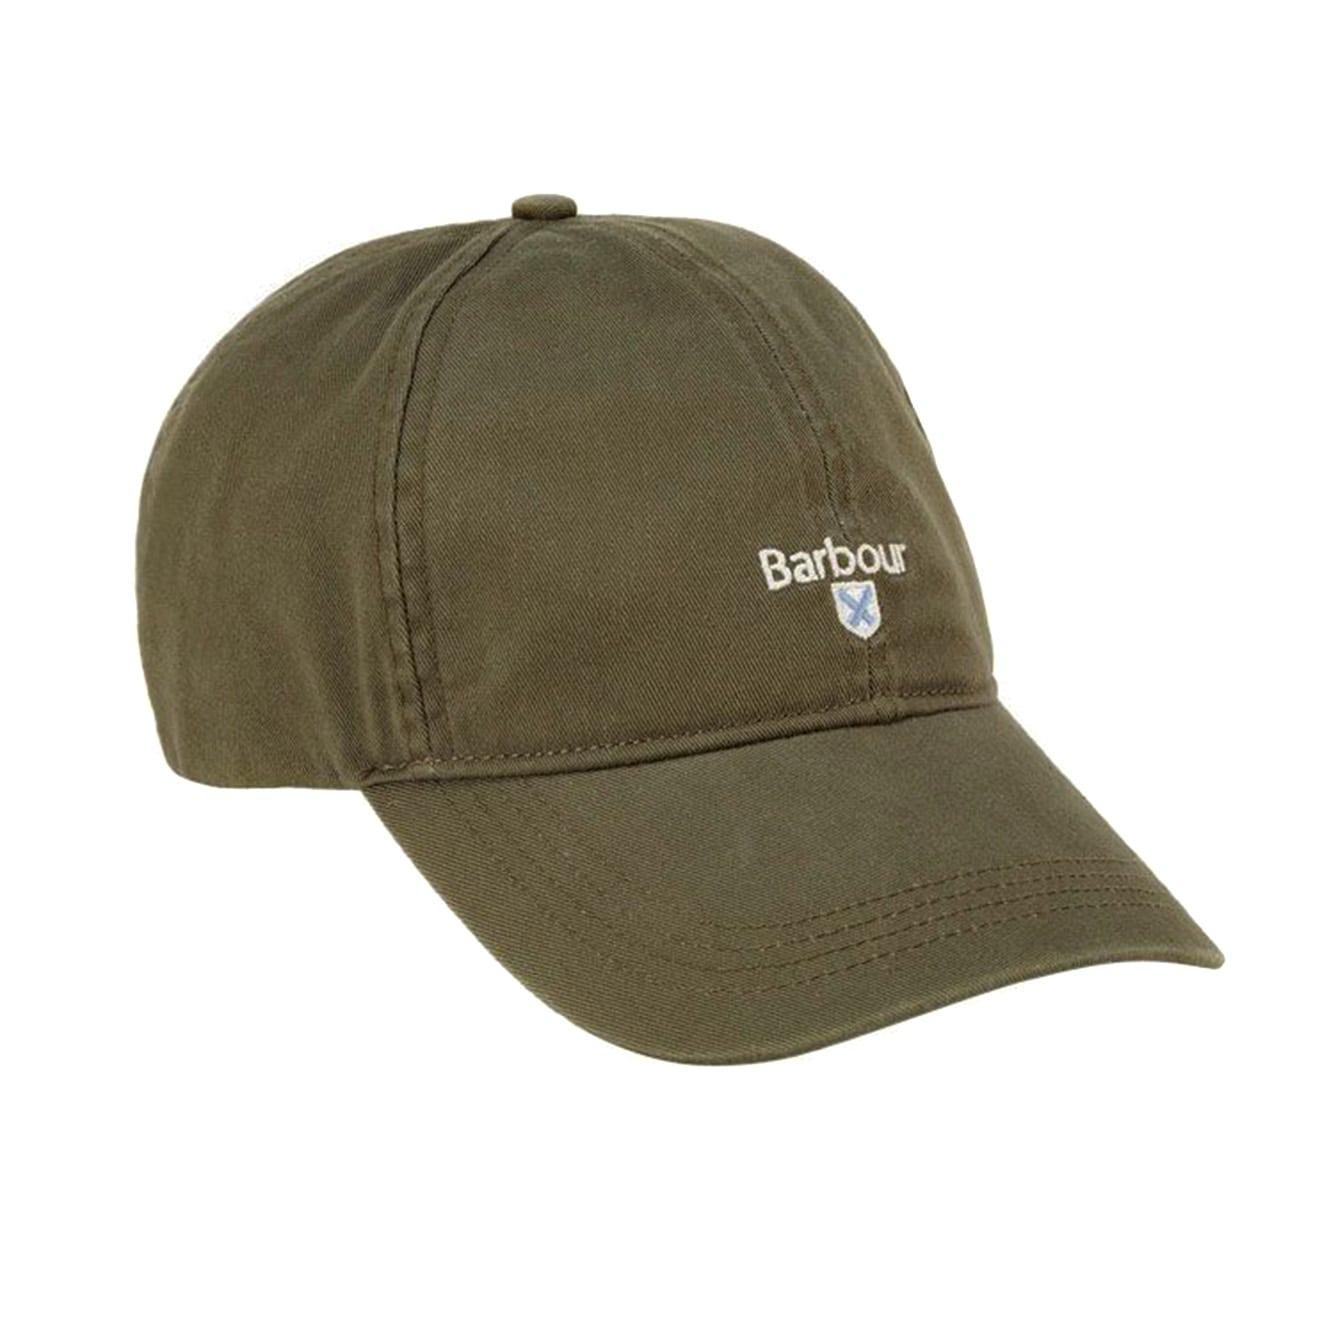 1be84d85ec0 Barbour Patchwork Flat Cap Navy Mix.  59.52 View product · View Product ·  Barbour cascade Sports Cap Olive